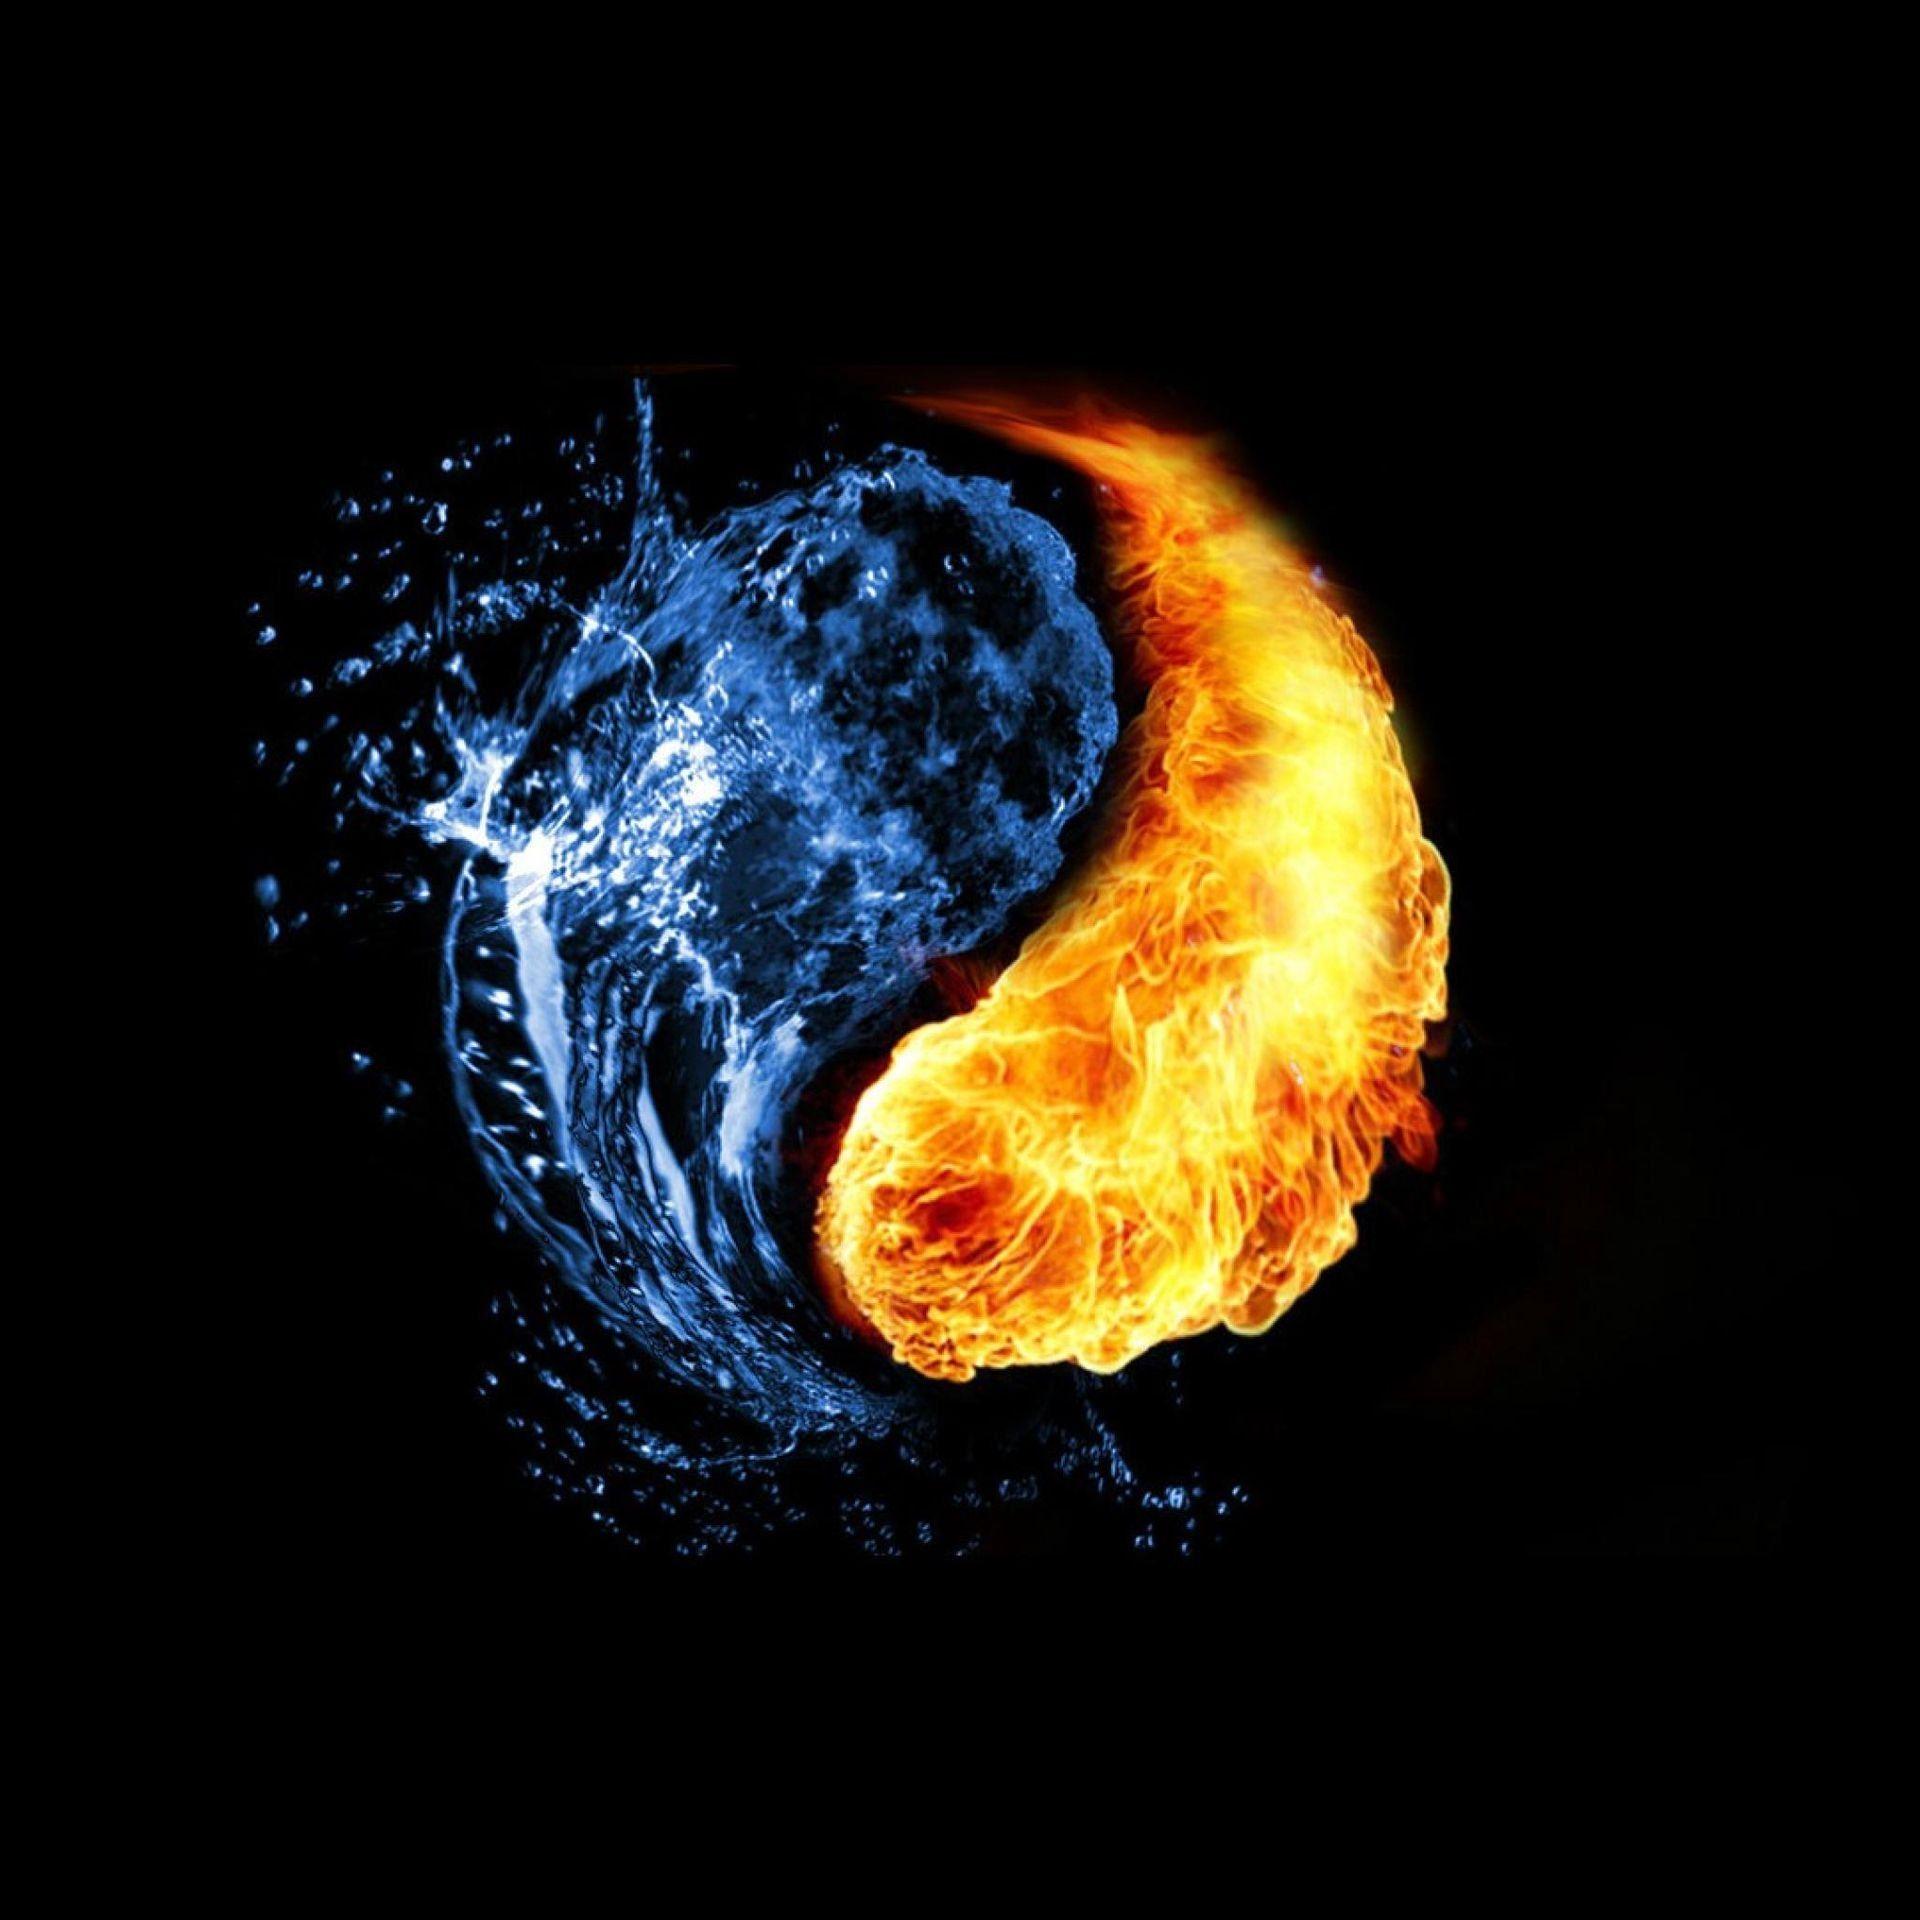 Steven Universe X Male Gem Reader Chapter 3 Opposites Fire And Ice Wallpaper Yin Yang Art Yin Yang